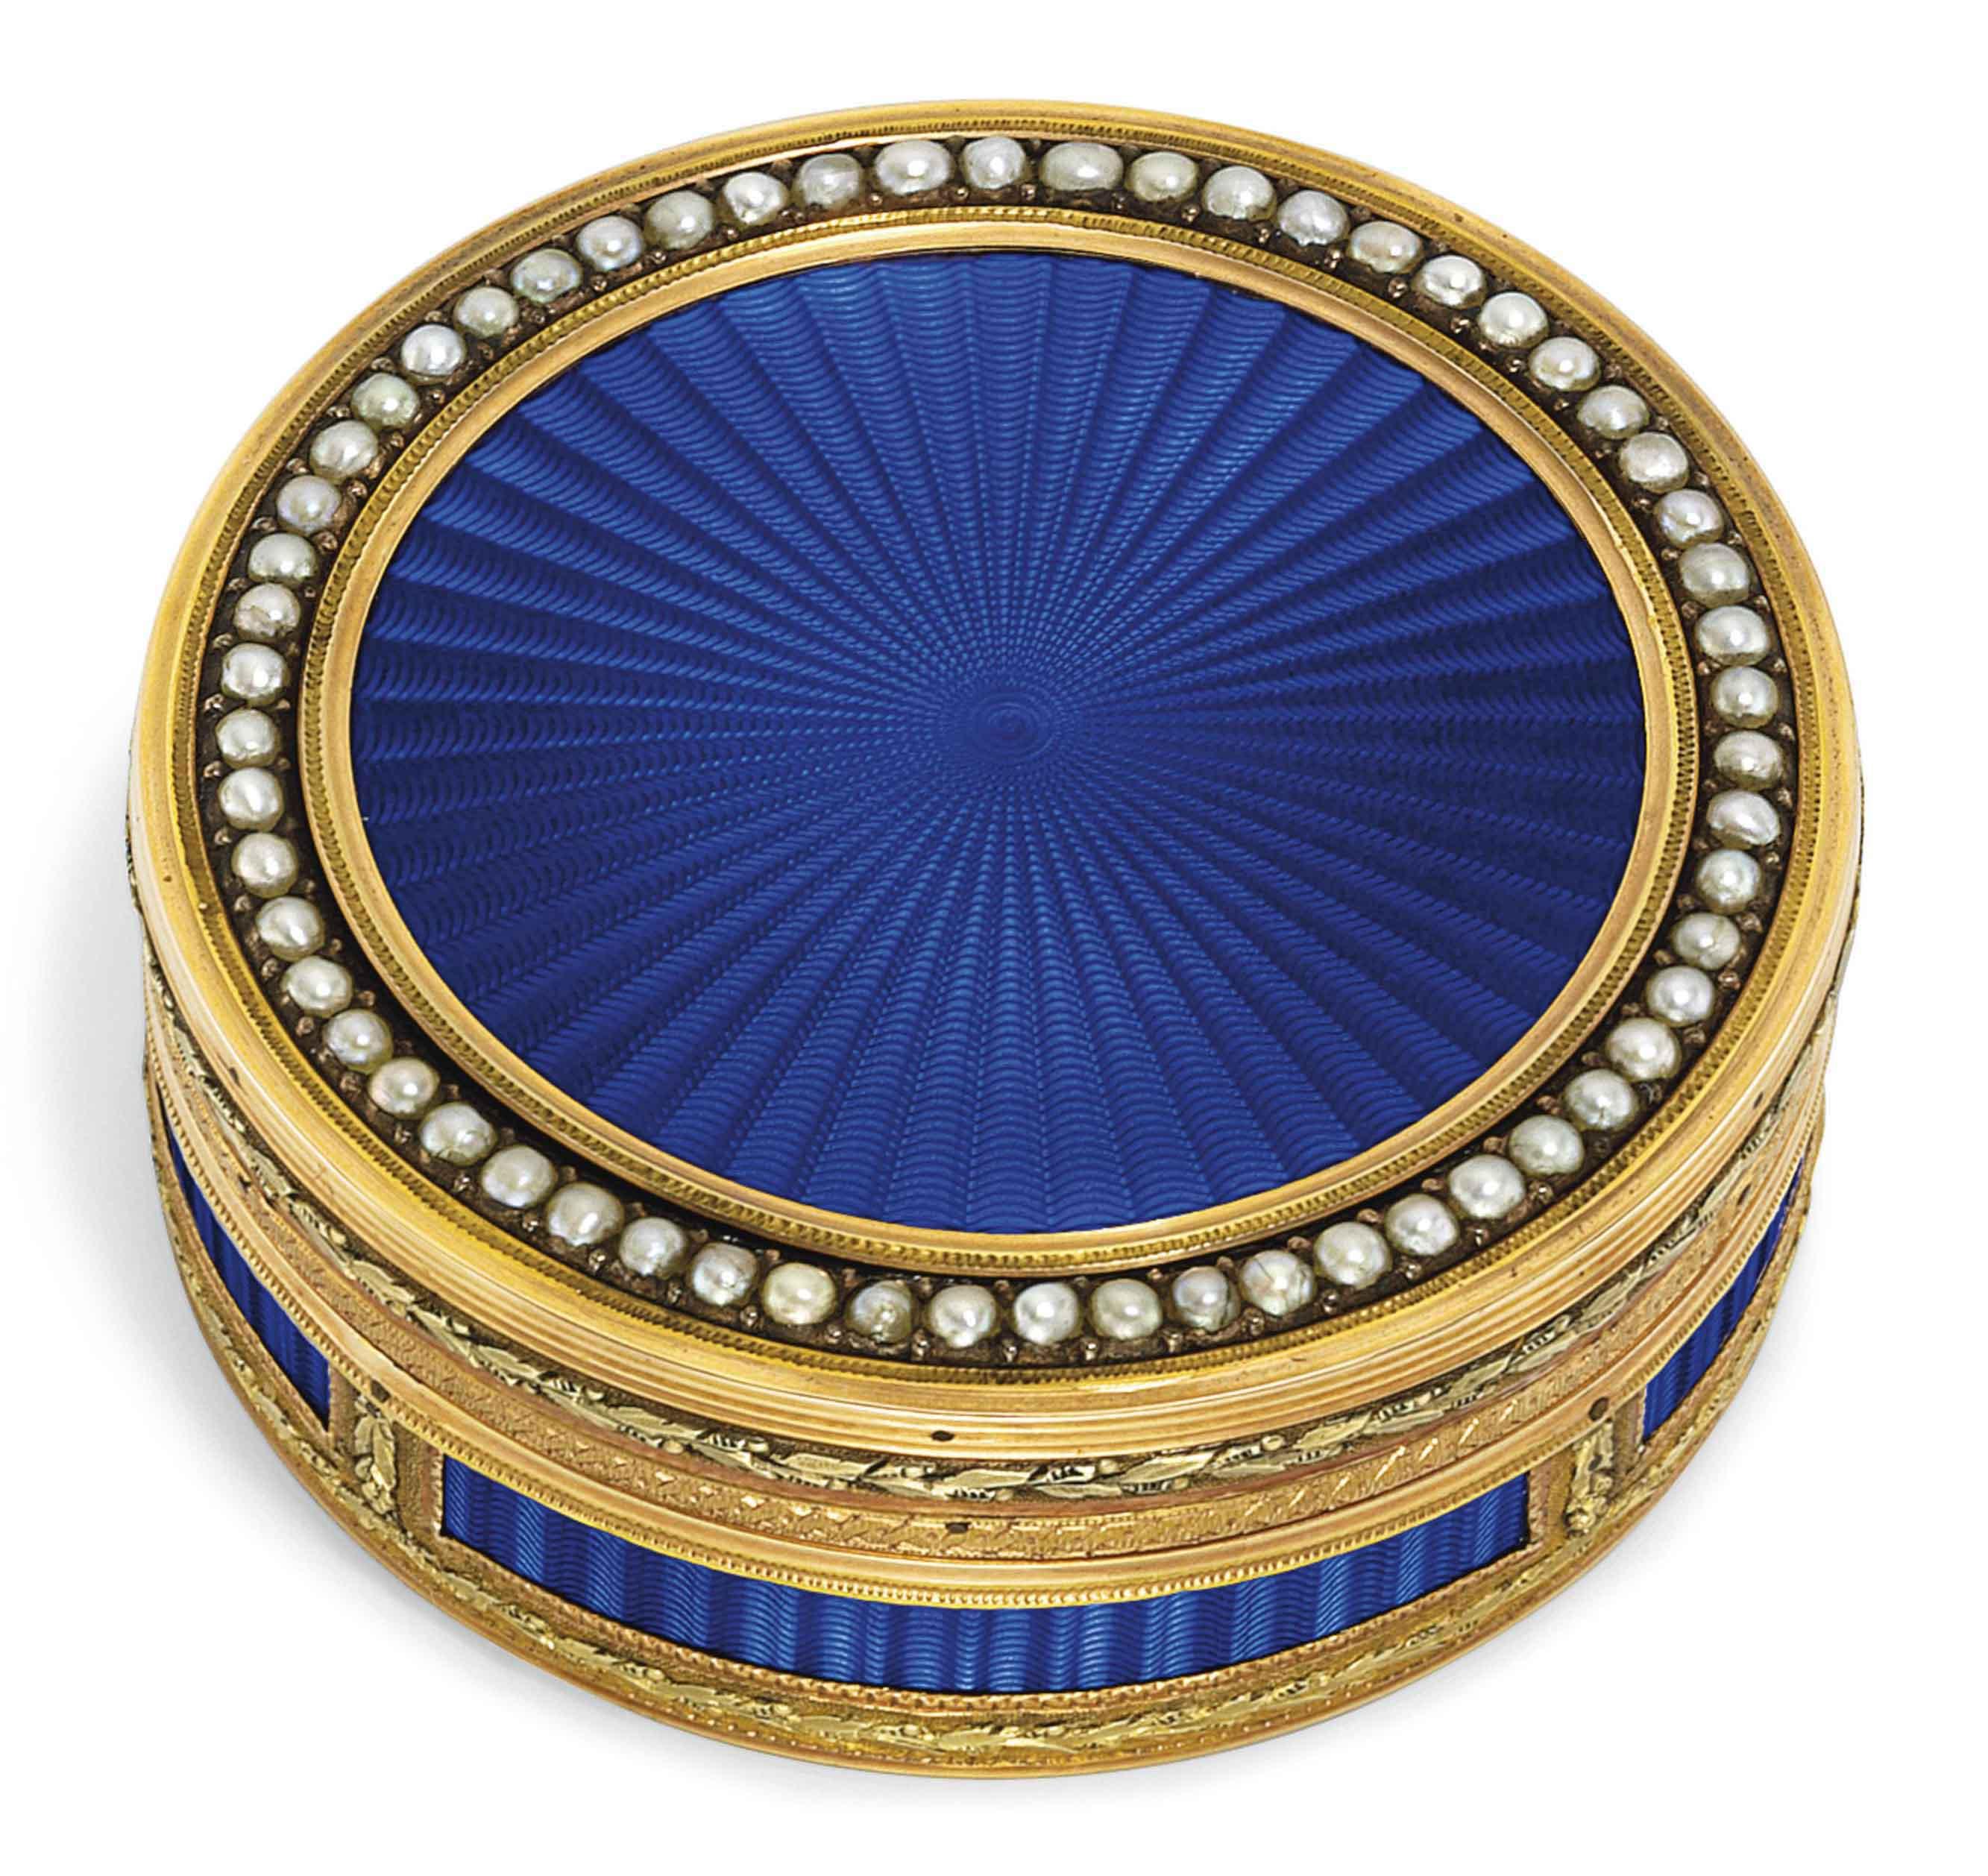 A LOUIS XVI SPLIT-PEARL BORDERED ENAMELLED GOLD BOITE-A-ROUGE